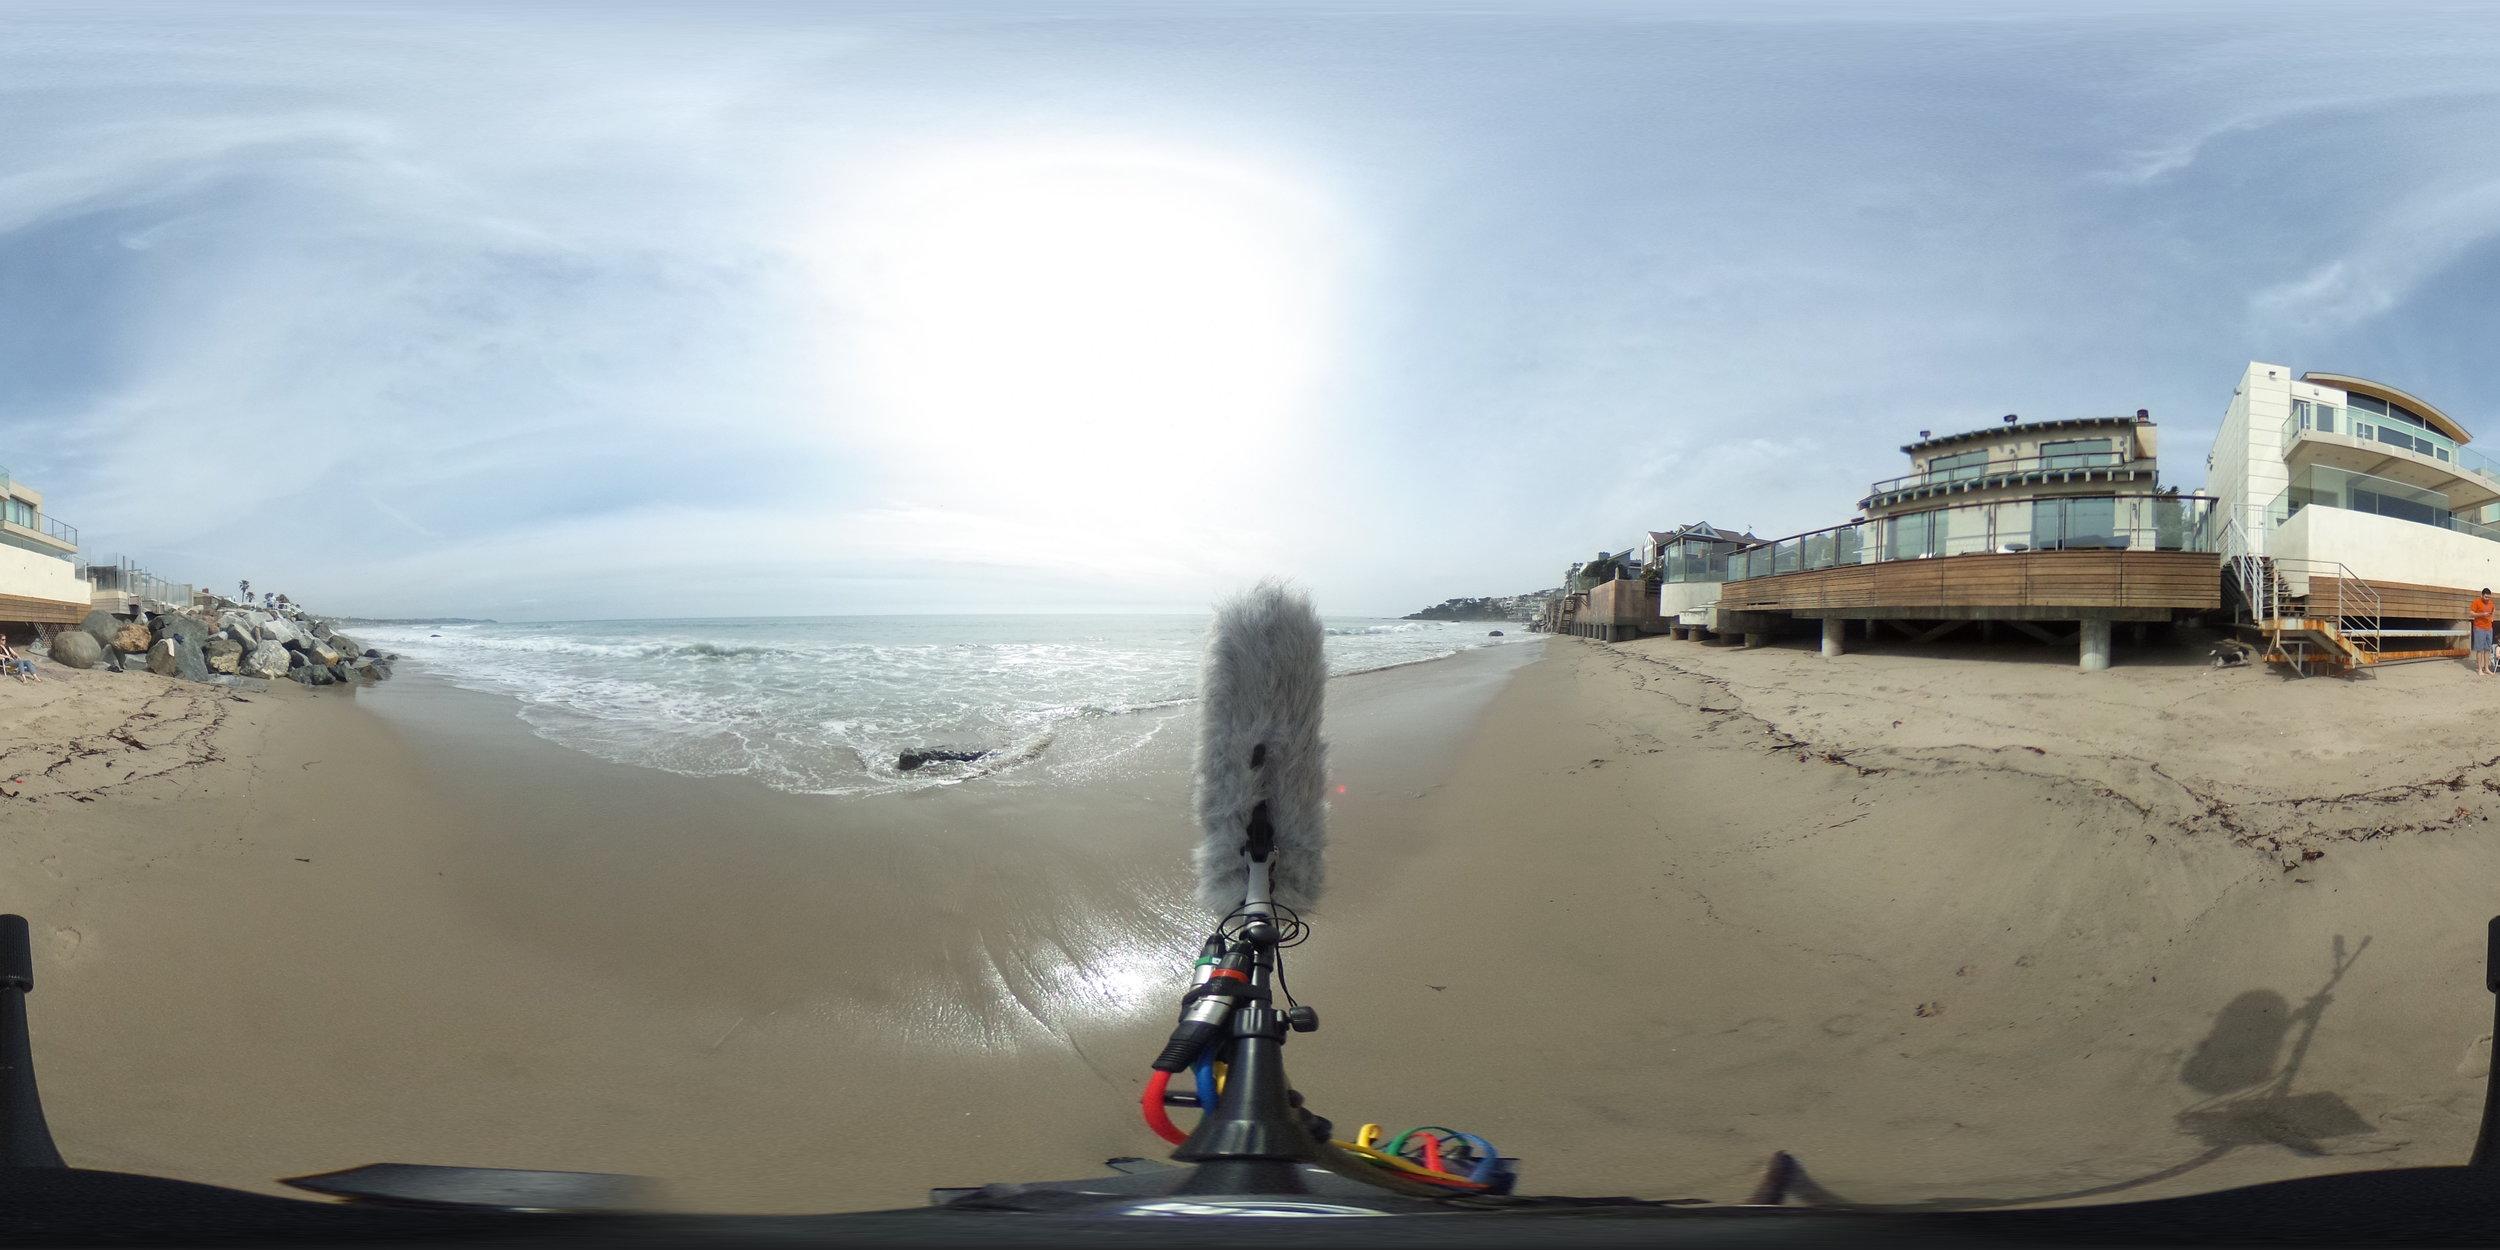 EXT_Day_Beach_SteadyOceanWaves_IntheWash_Close_NoPeople_JPEG.JPG